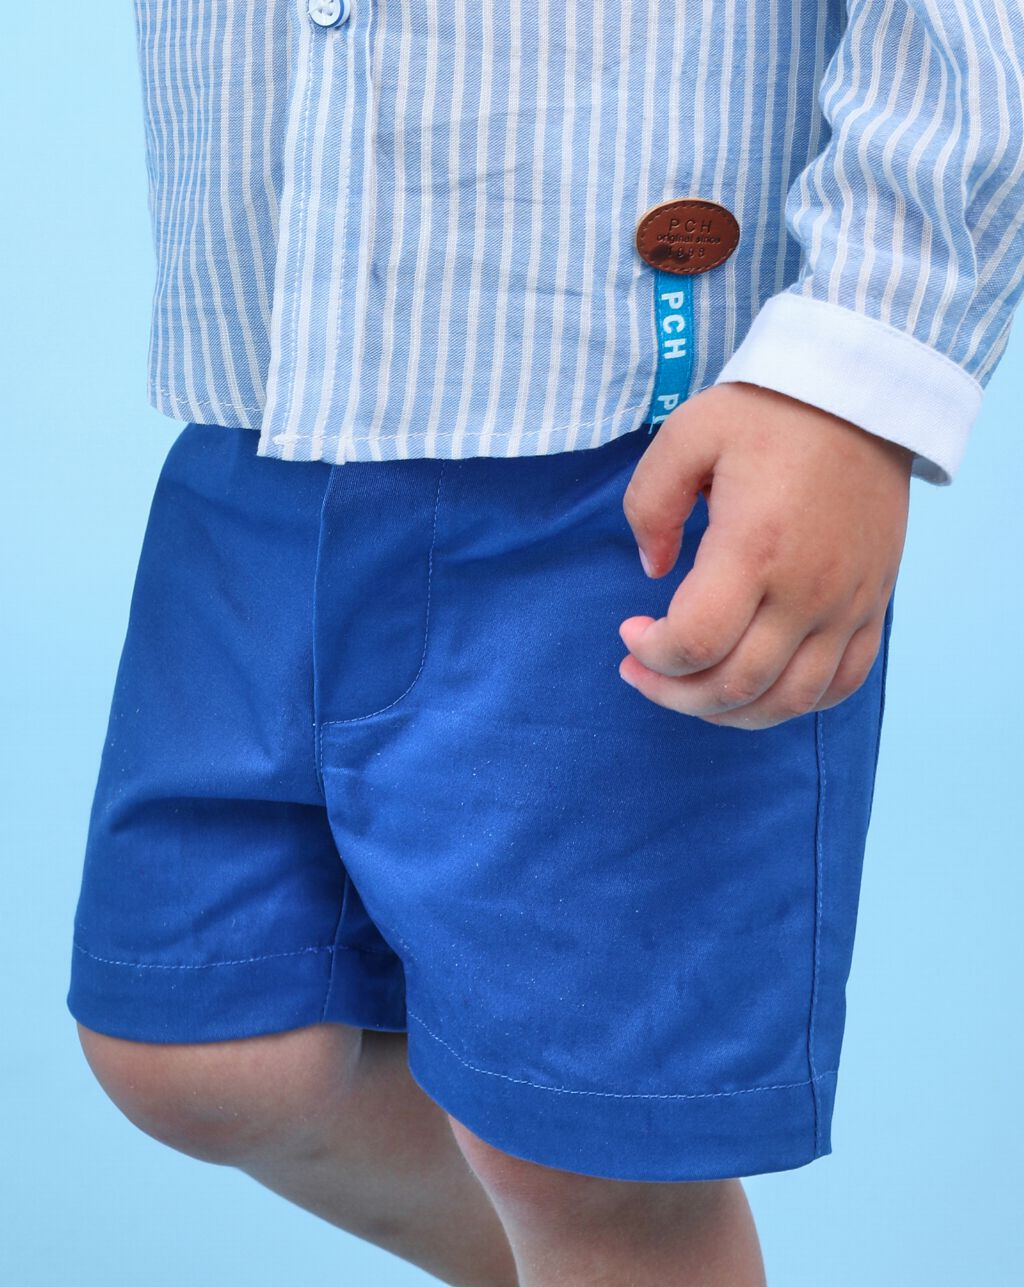 Pan con Chocolate: Shorts Earl